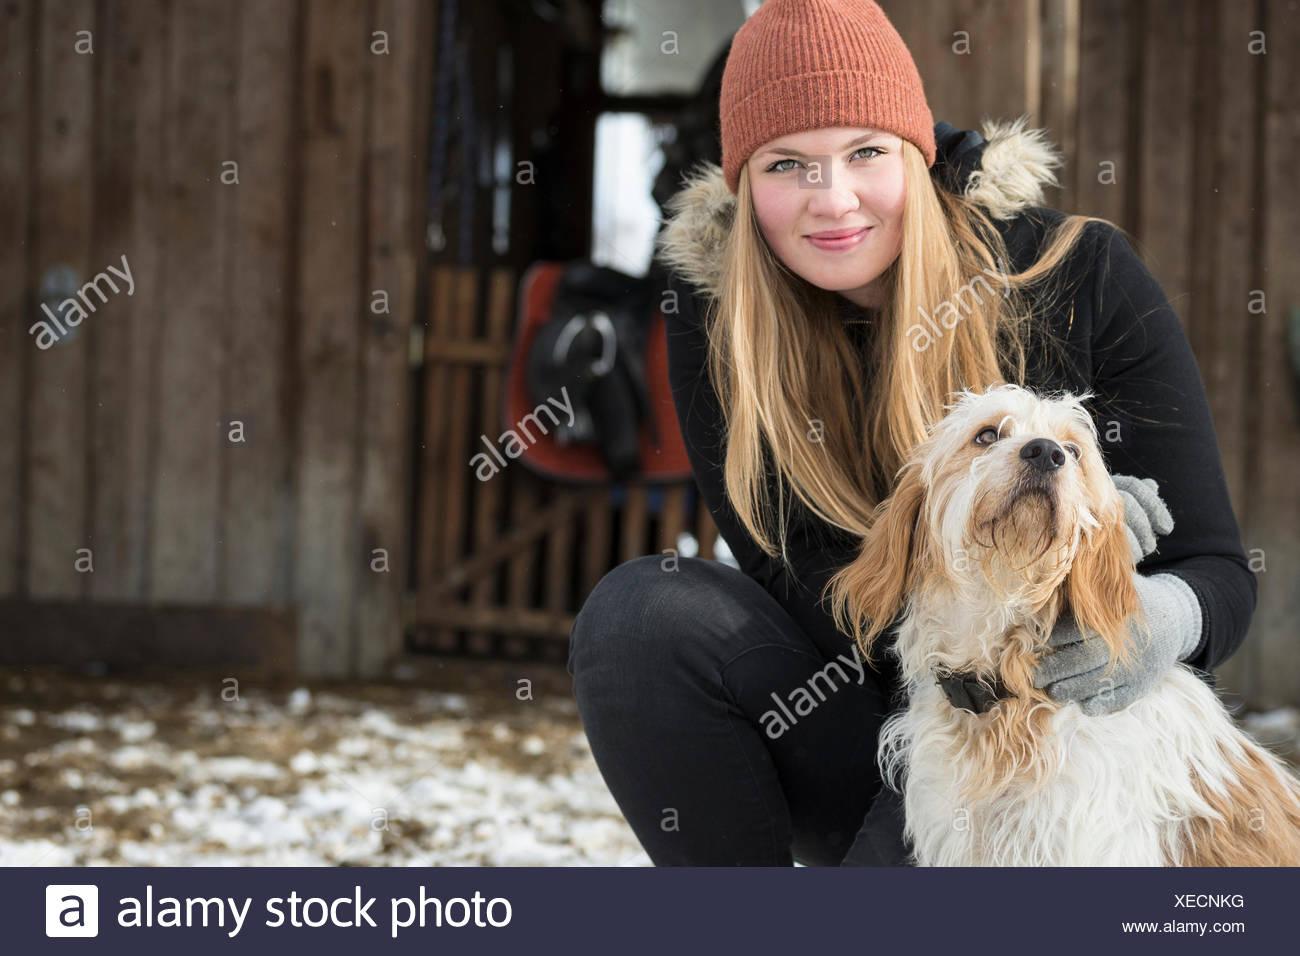 Portrait of teenage girl with dog, Bavaria, Germany - Stock Image